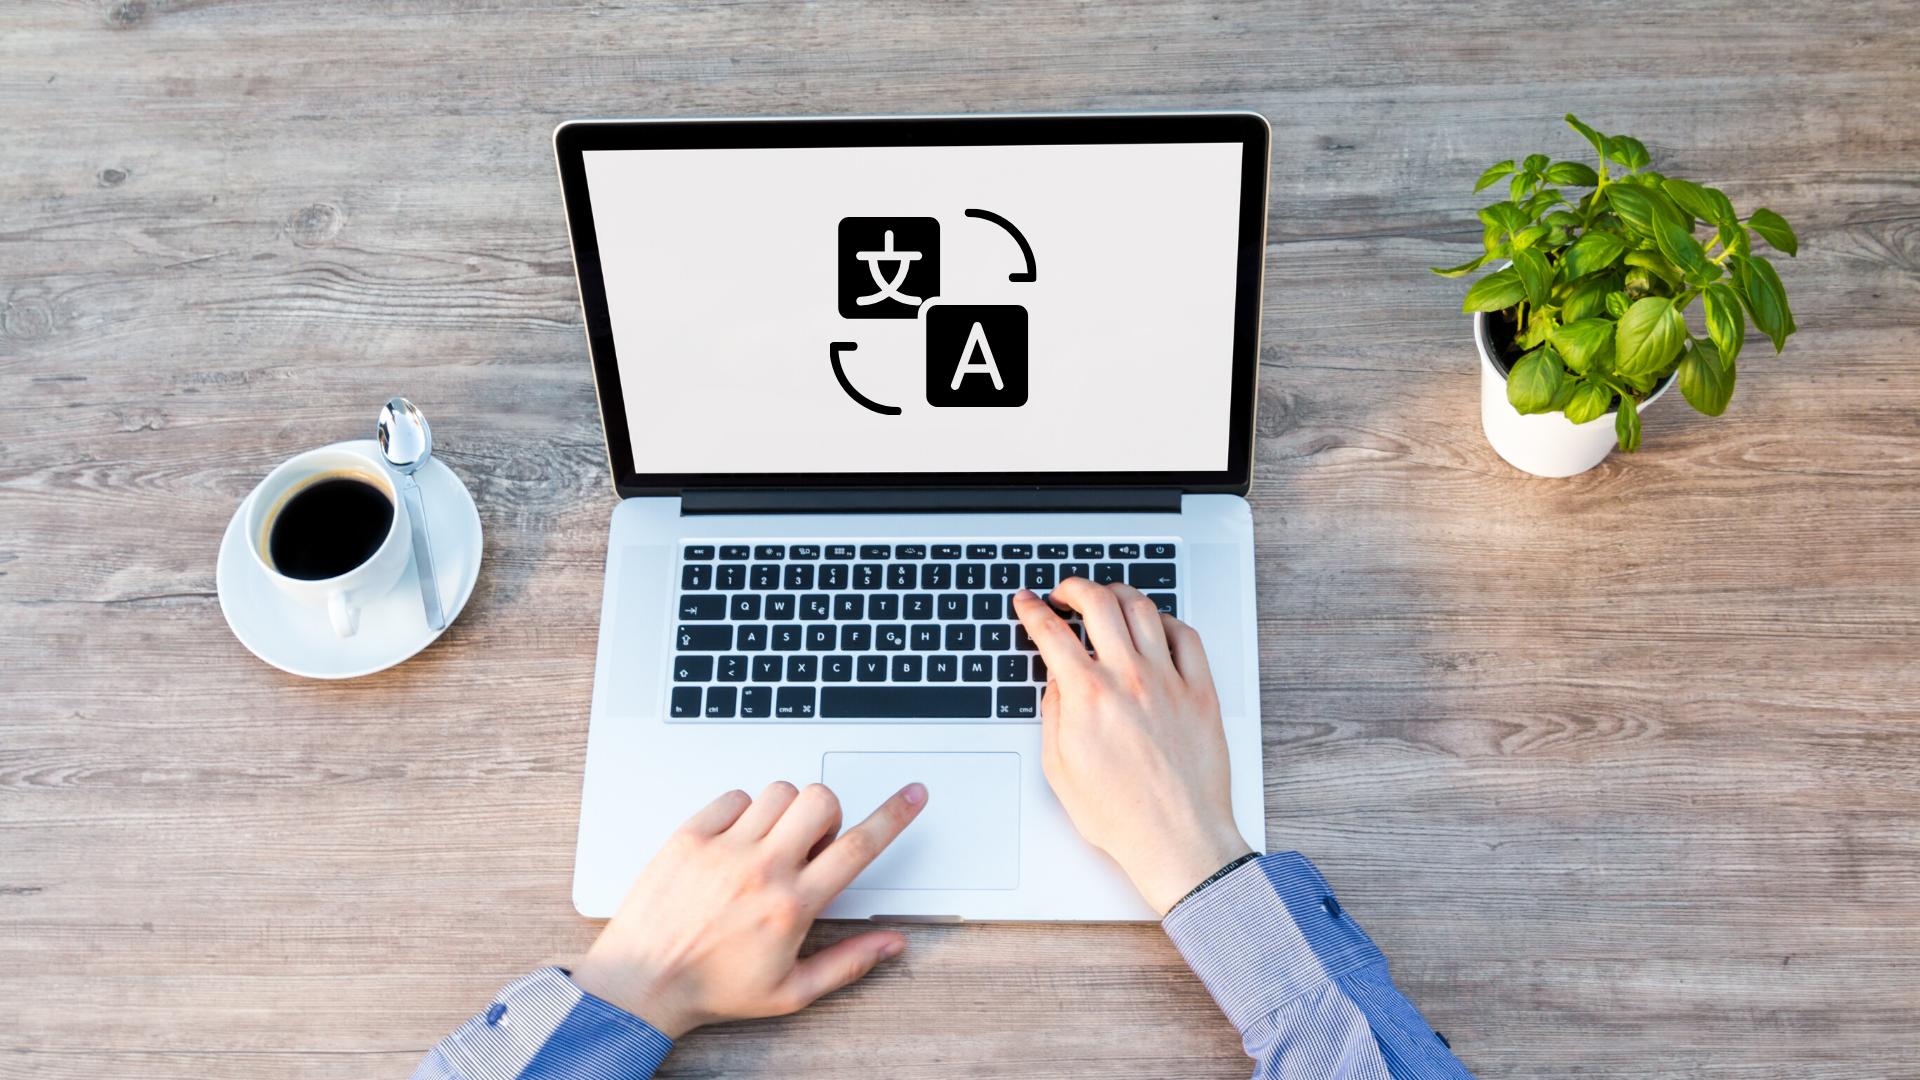 traduir un document gratis